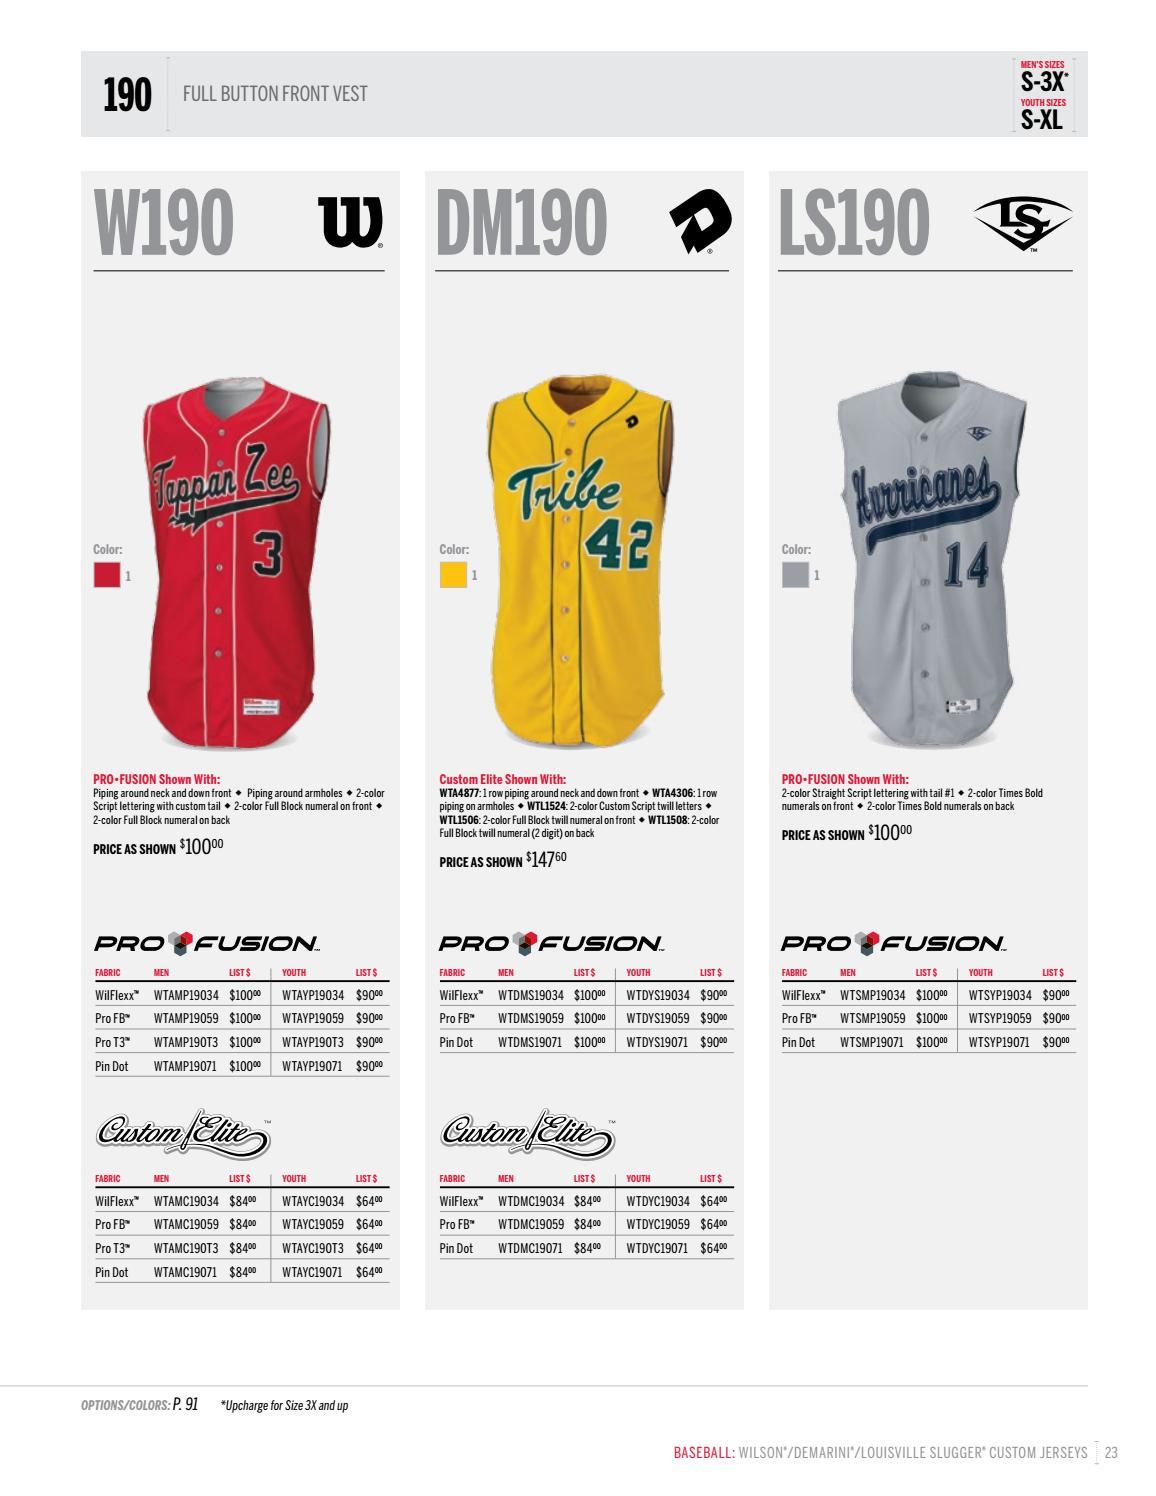 Wilson Baseball and Softball Uniform Catalog 2017 by LTS